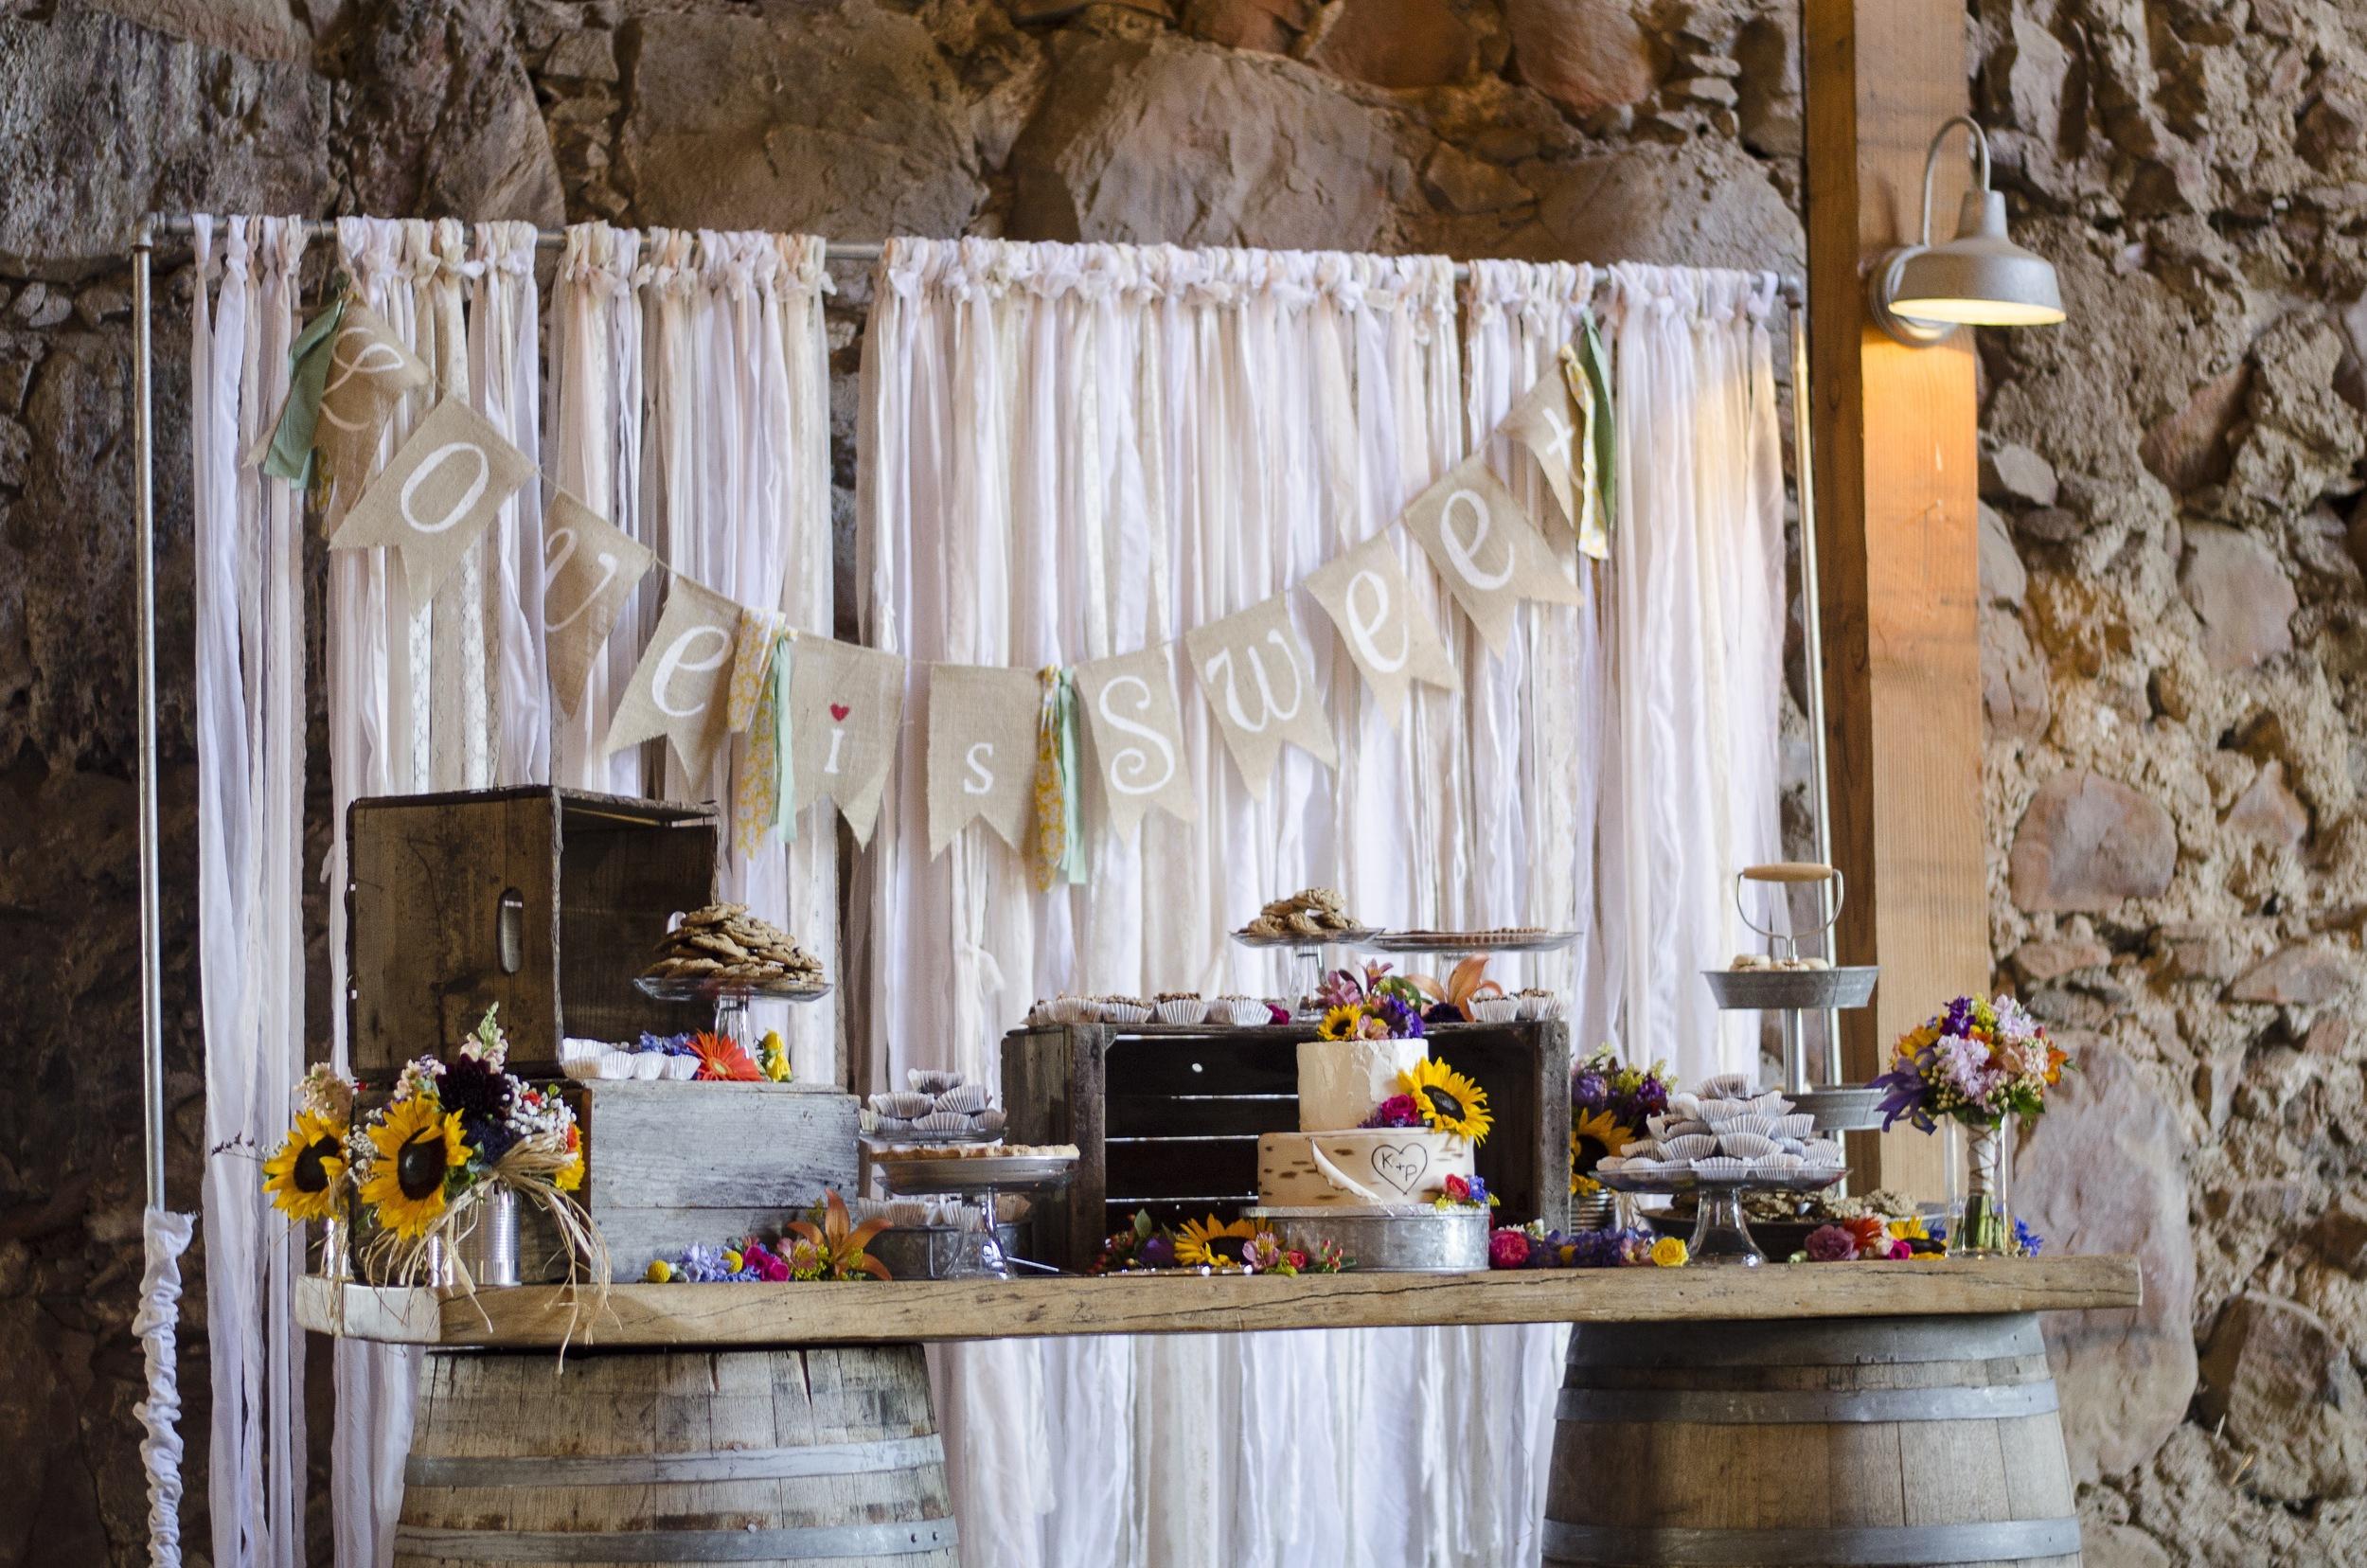 Wedding Cake and Dessert Buffet at Santa Margarita Ranch